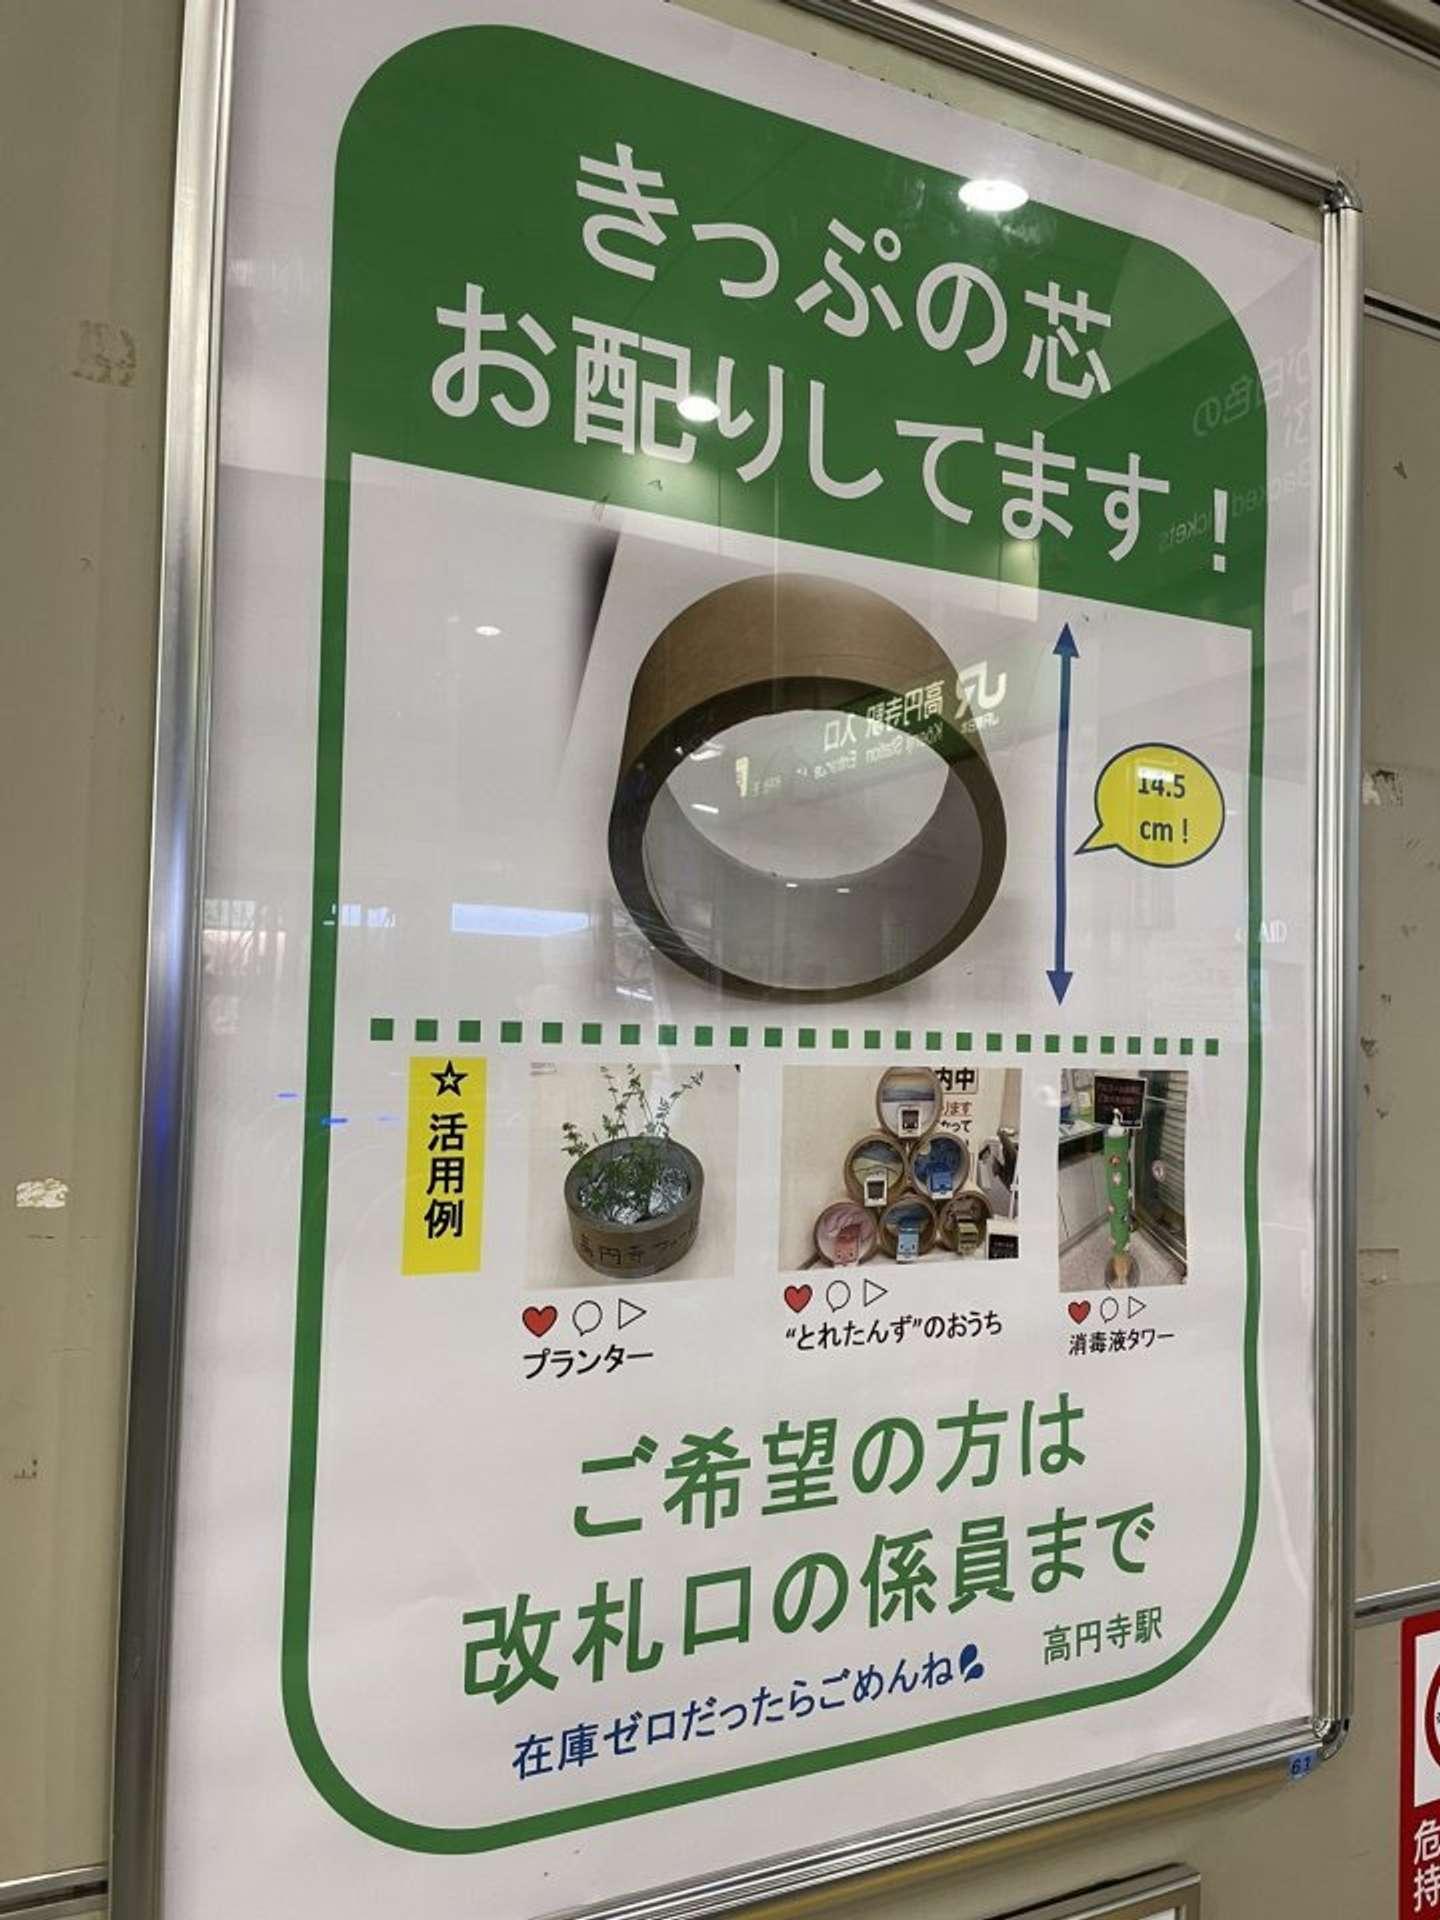 JR高円寺駅に掲示されている(画像は投稿者提供)